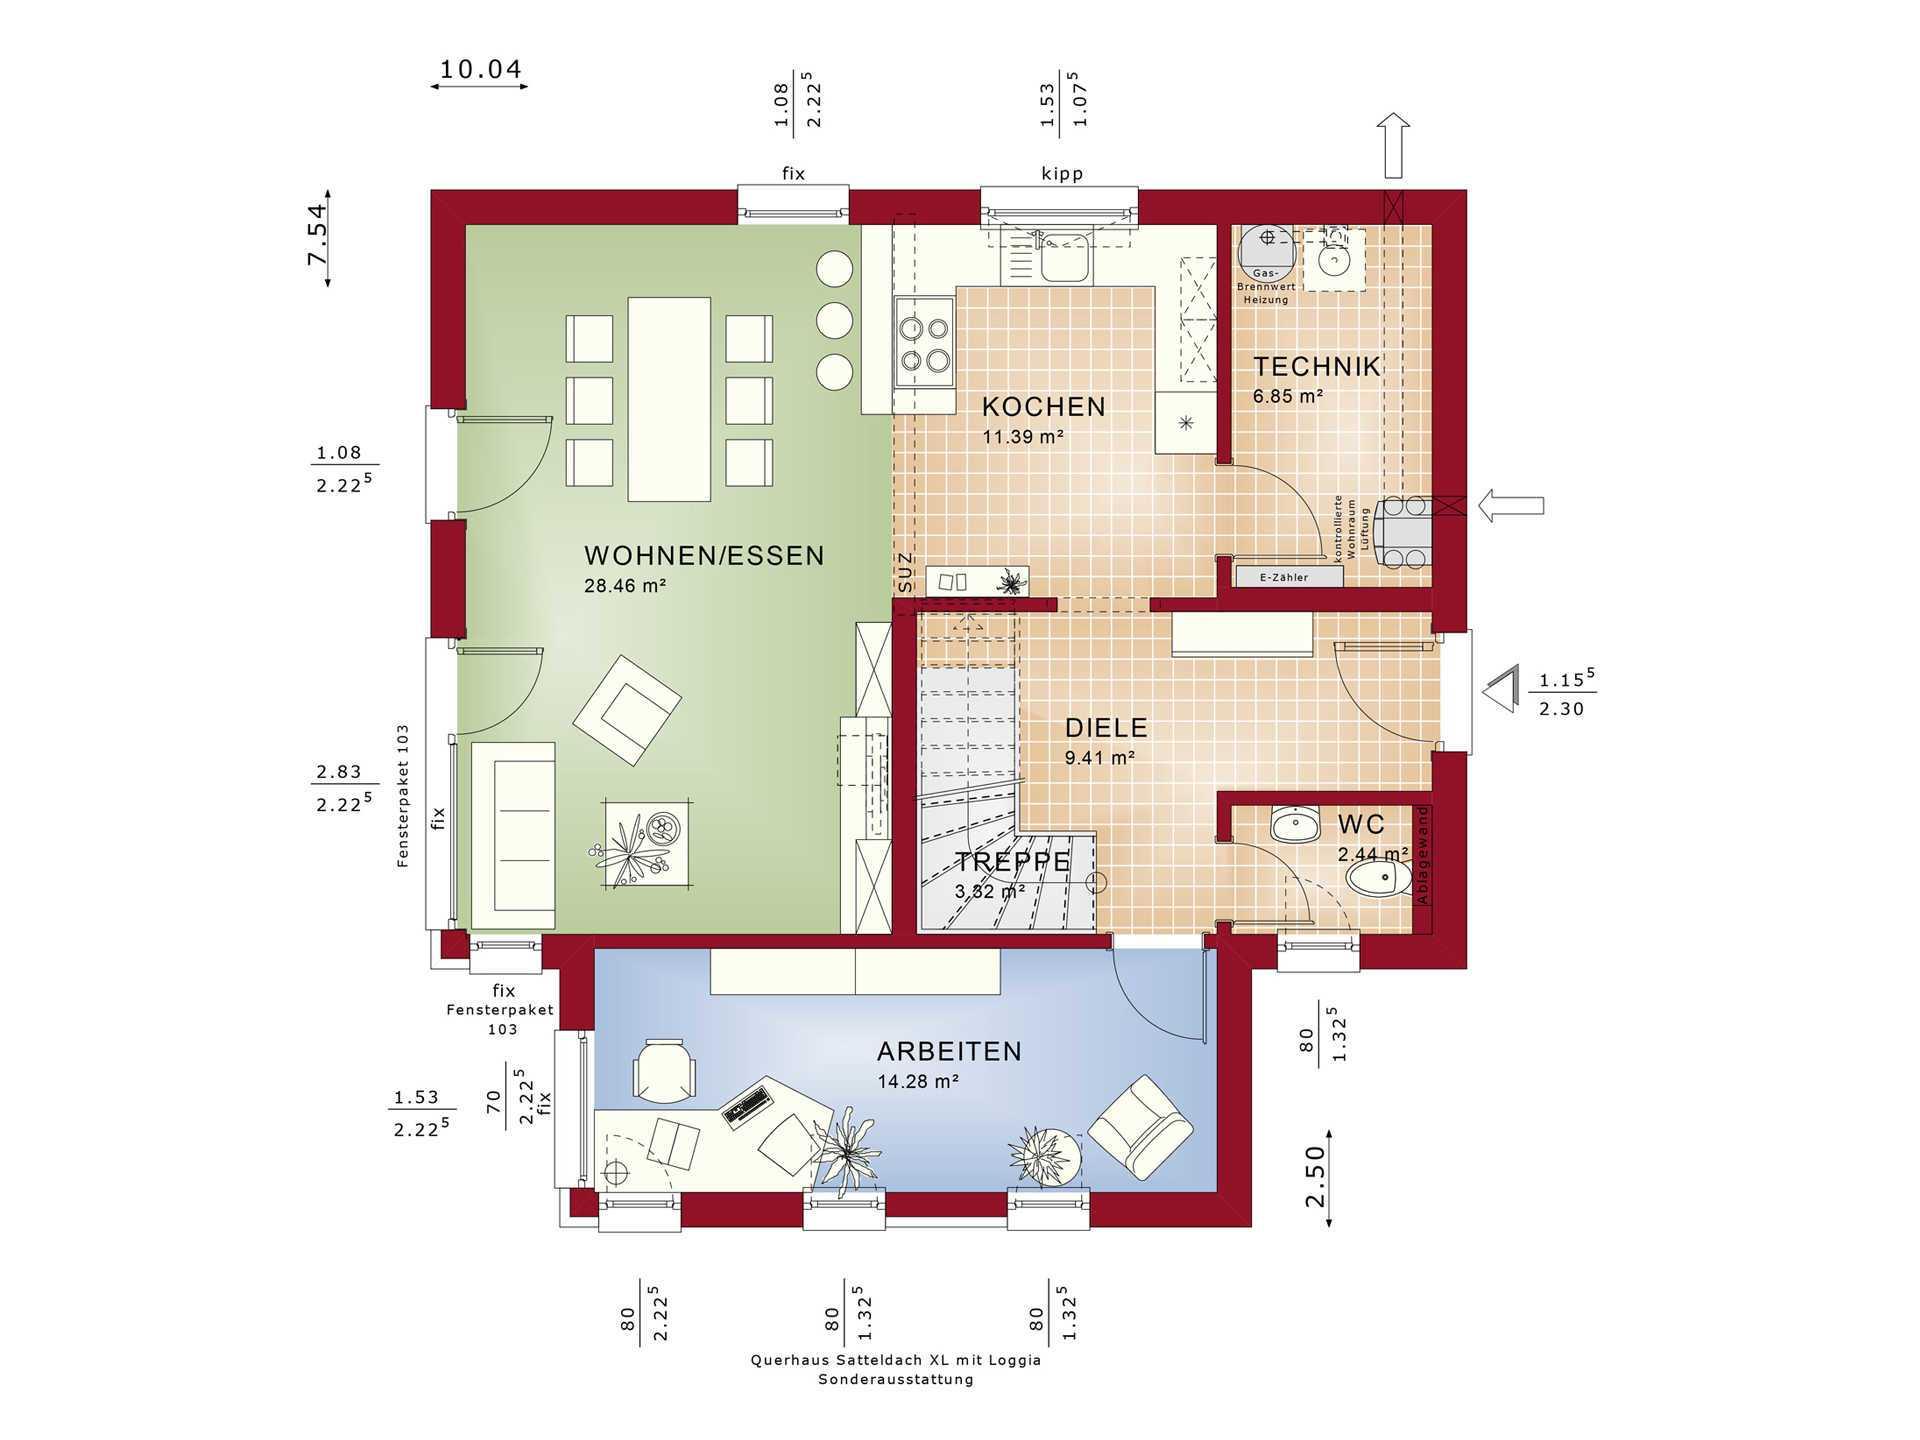 Grundriss EG Edition 3 V6 - Einfamilienhaus